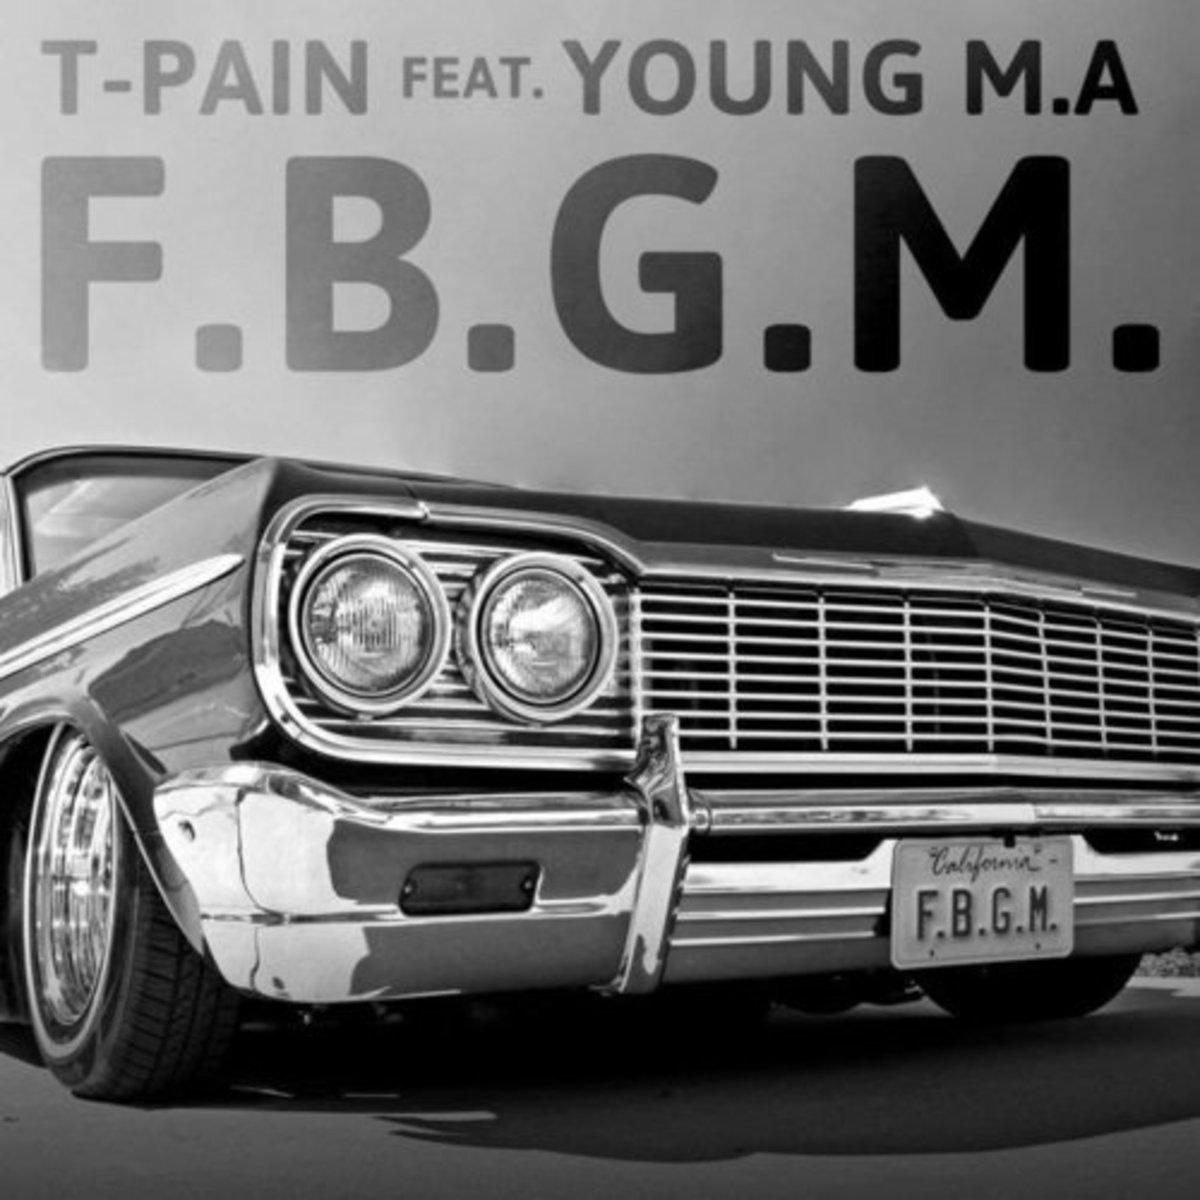 t-pain-fbgm.jpg